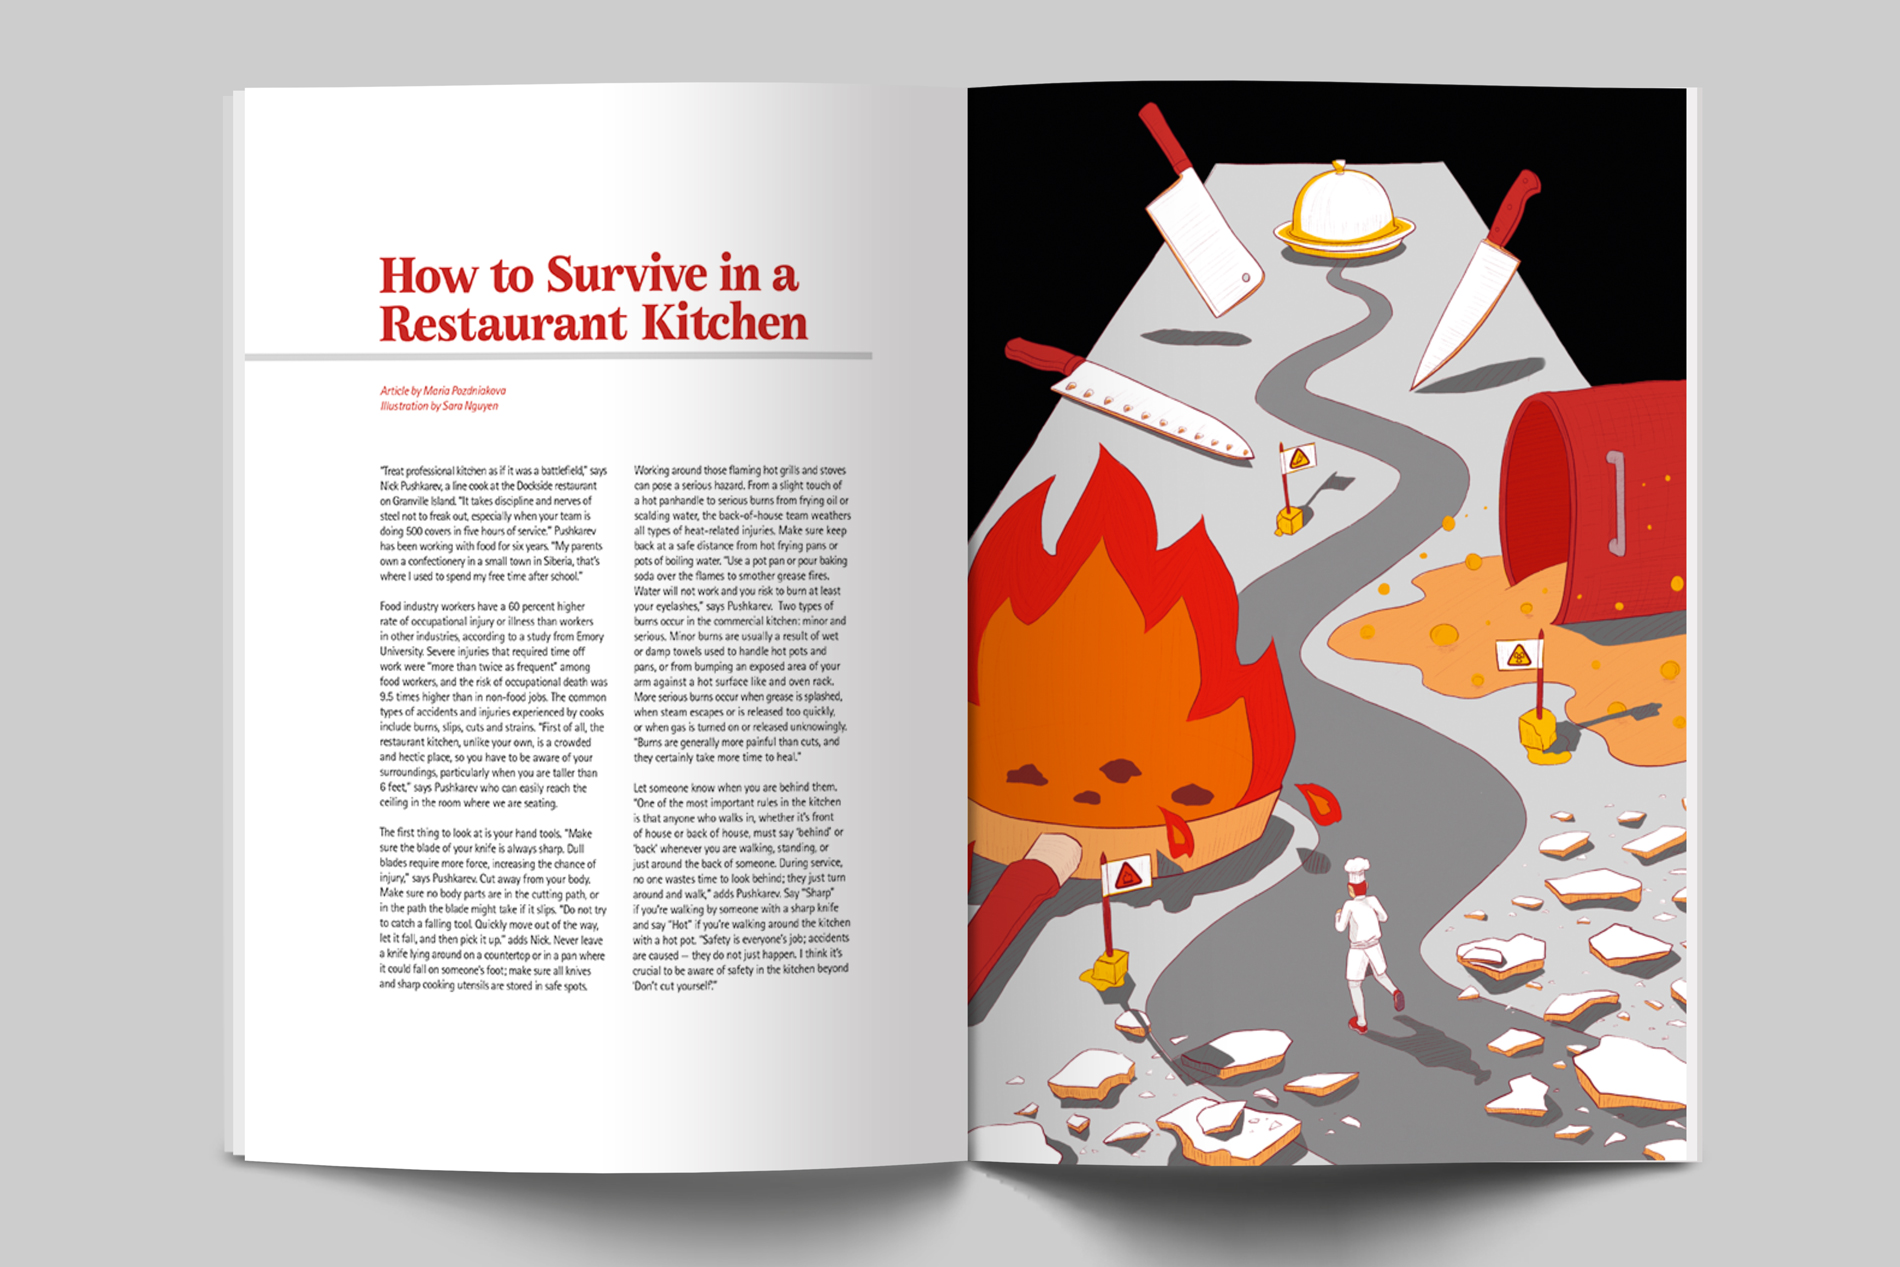 Sara Nguyen—How to Survive in a Restaurant Kitchen